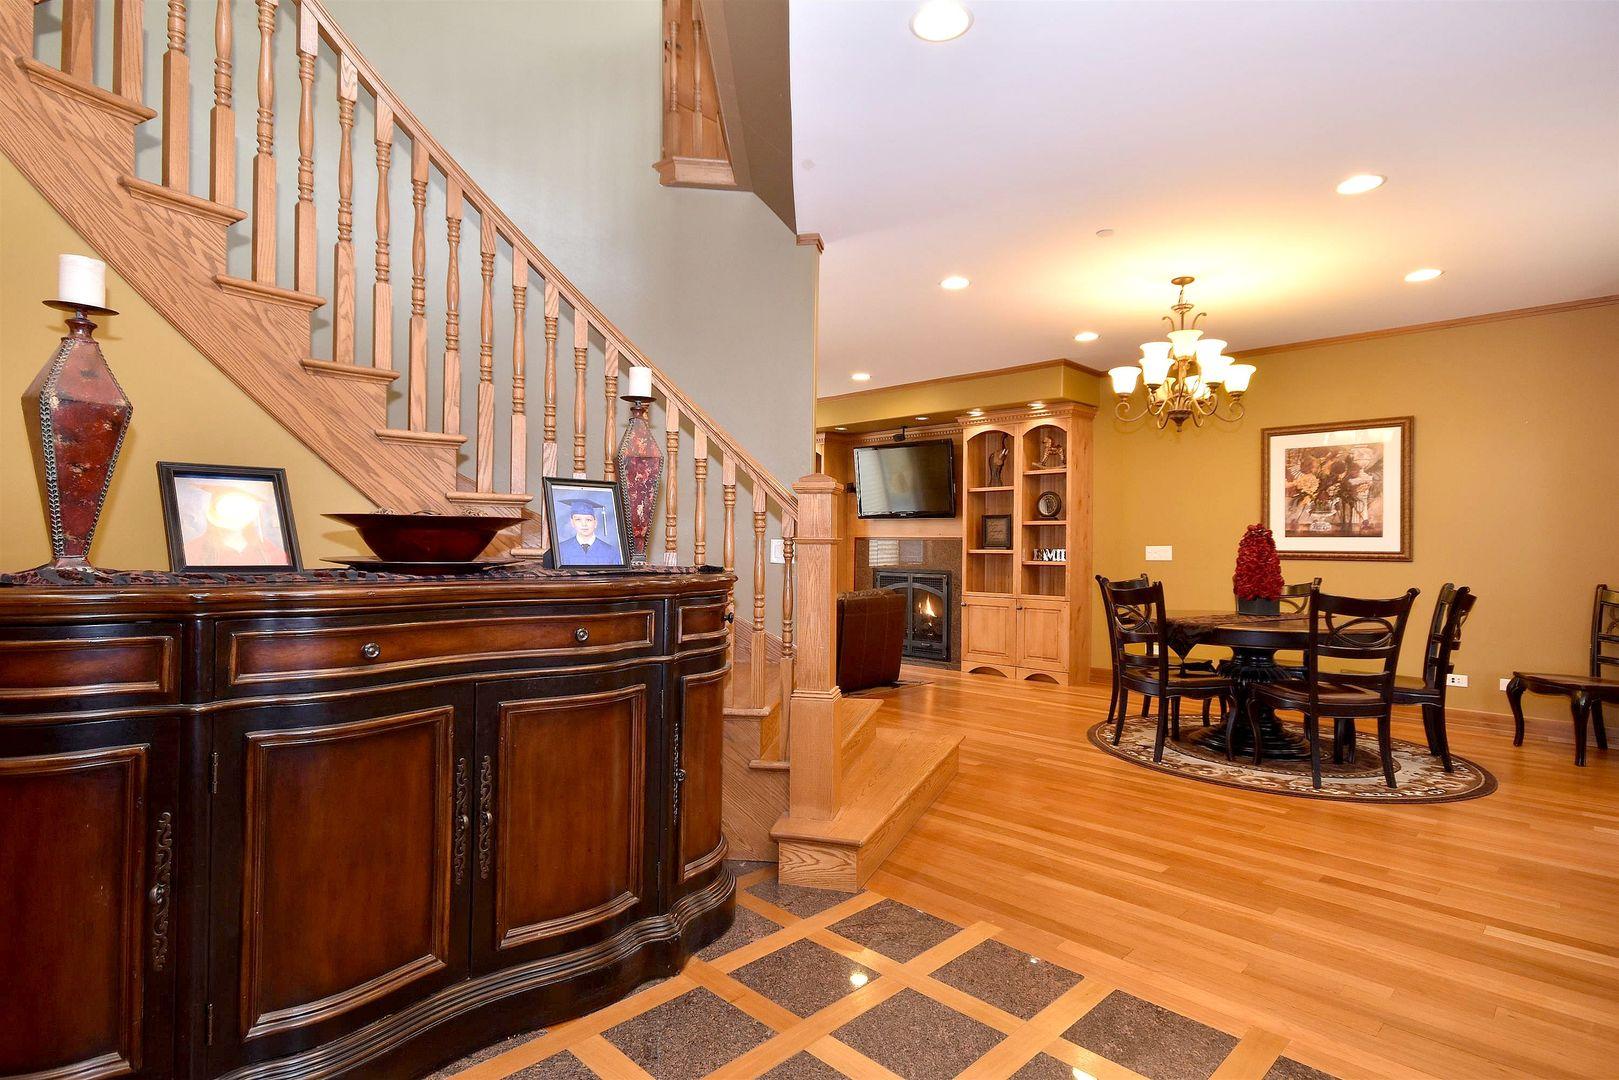 1707 West Lincoln, Mount Prospect, Illinois, 60056